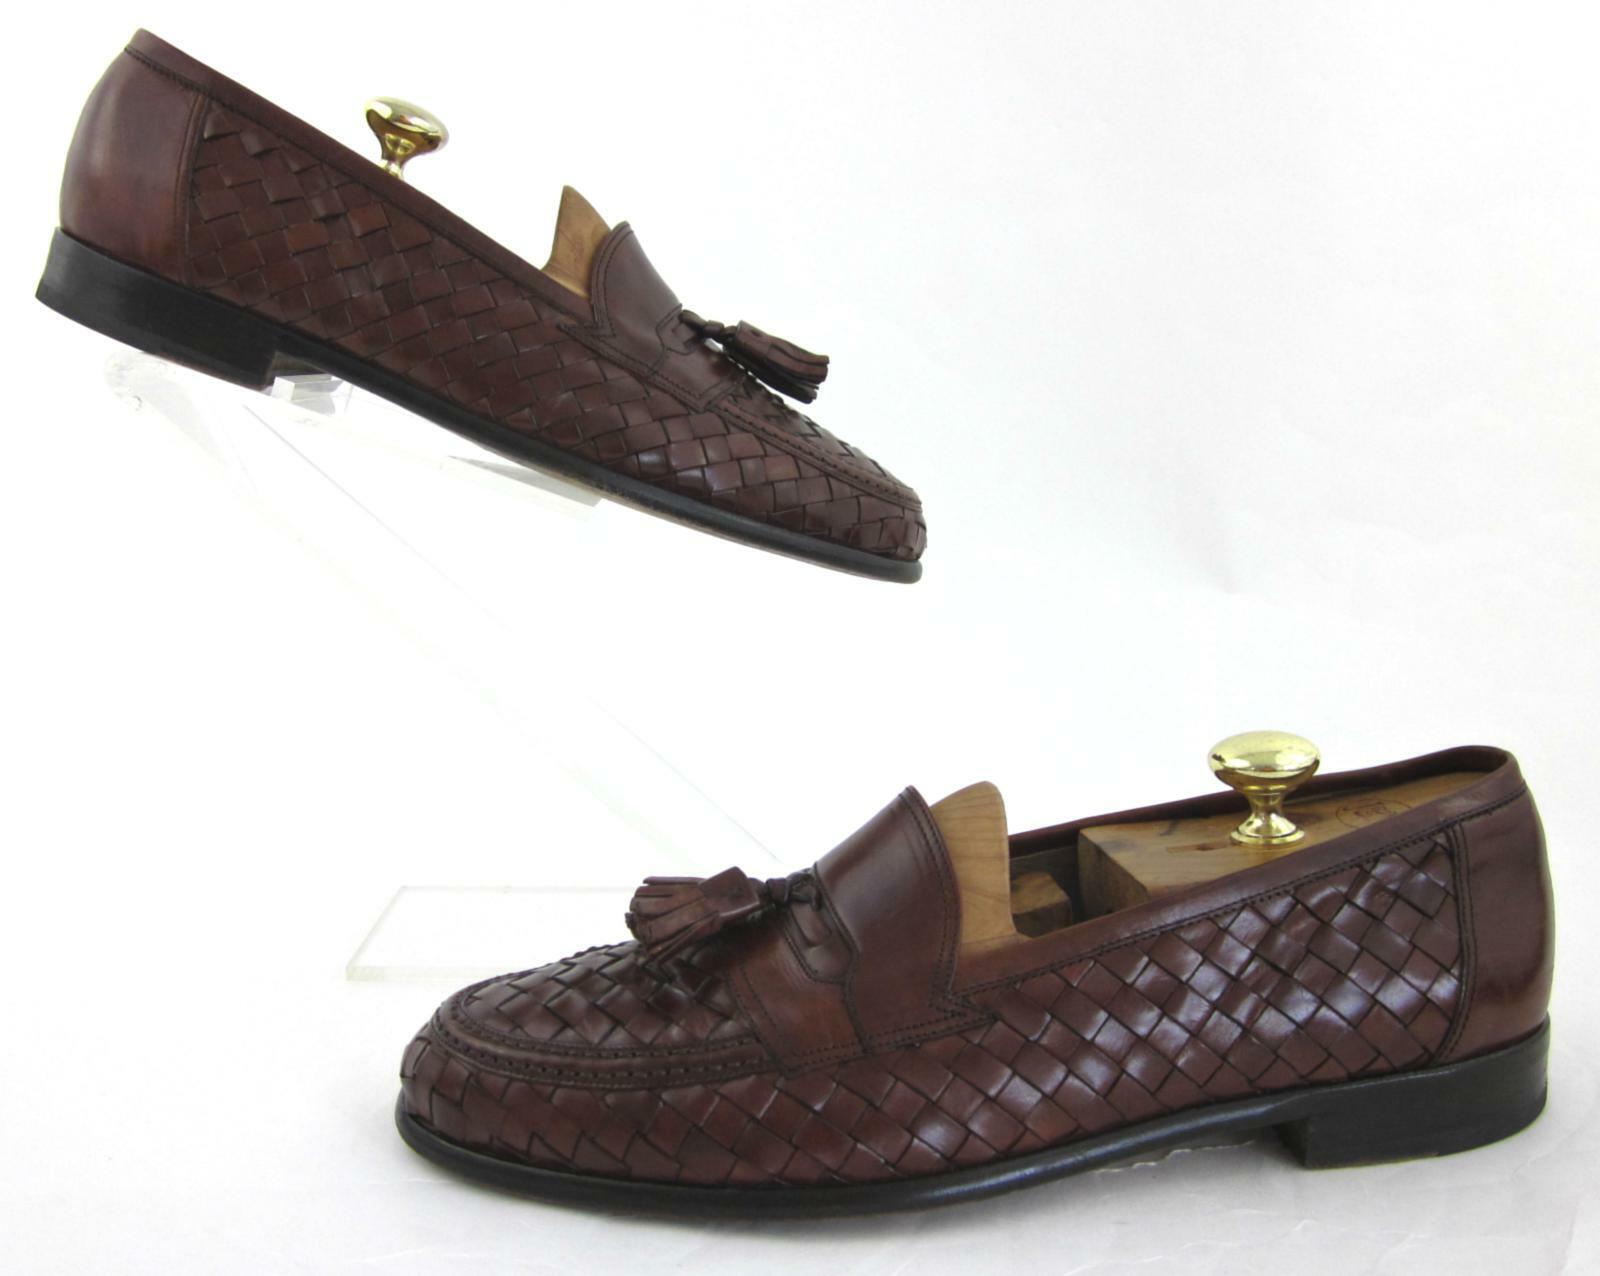 Bruno Magli Woven Leather Tassel Lofers Chestnut  US 10D Fits US 9.5D -10D  classico senza tempo